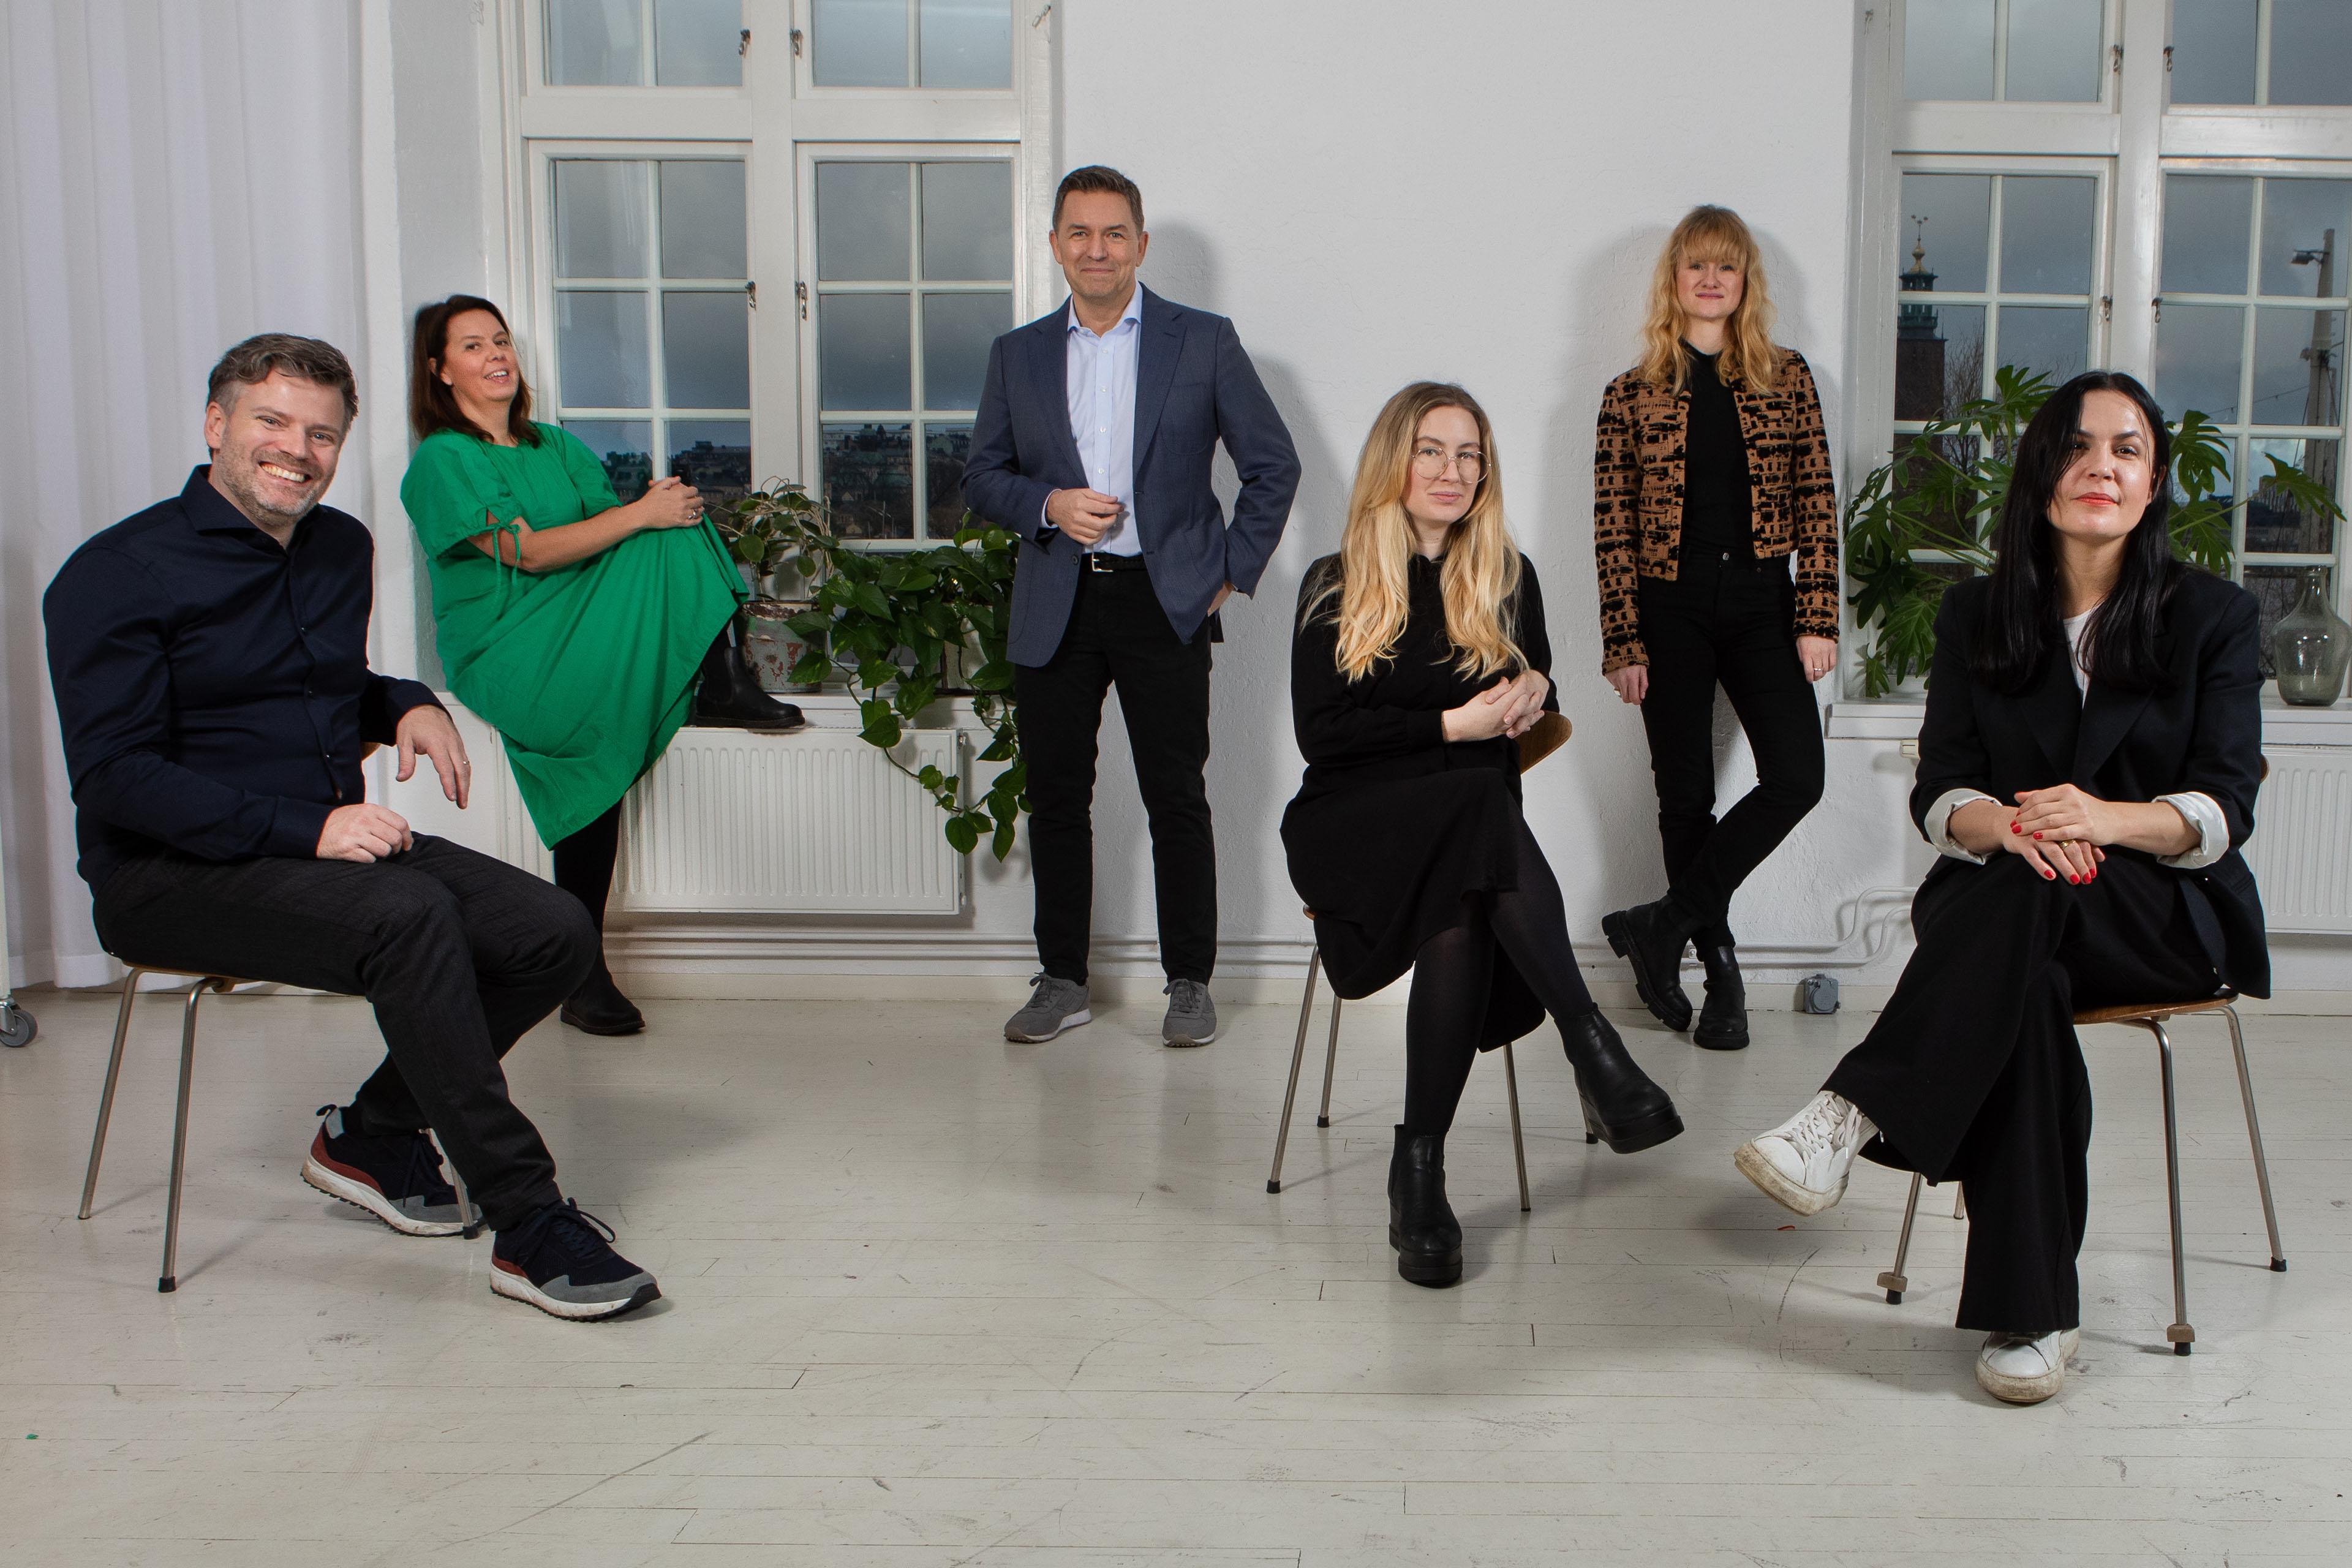 EY Doberman accelerates within sustainability - launches new innovation studio